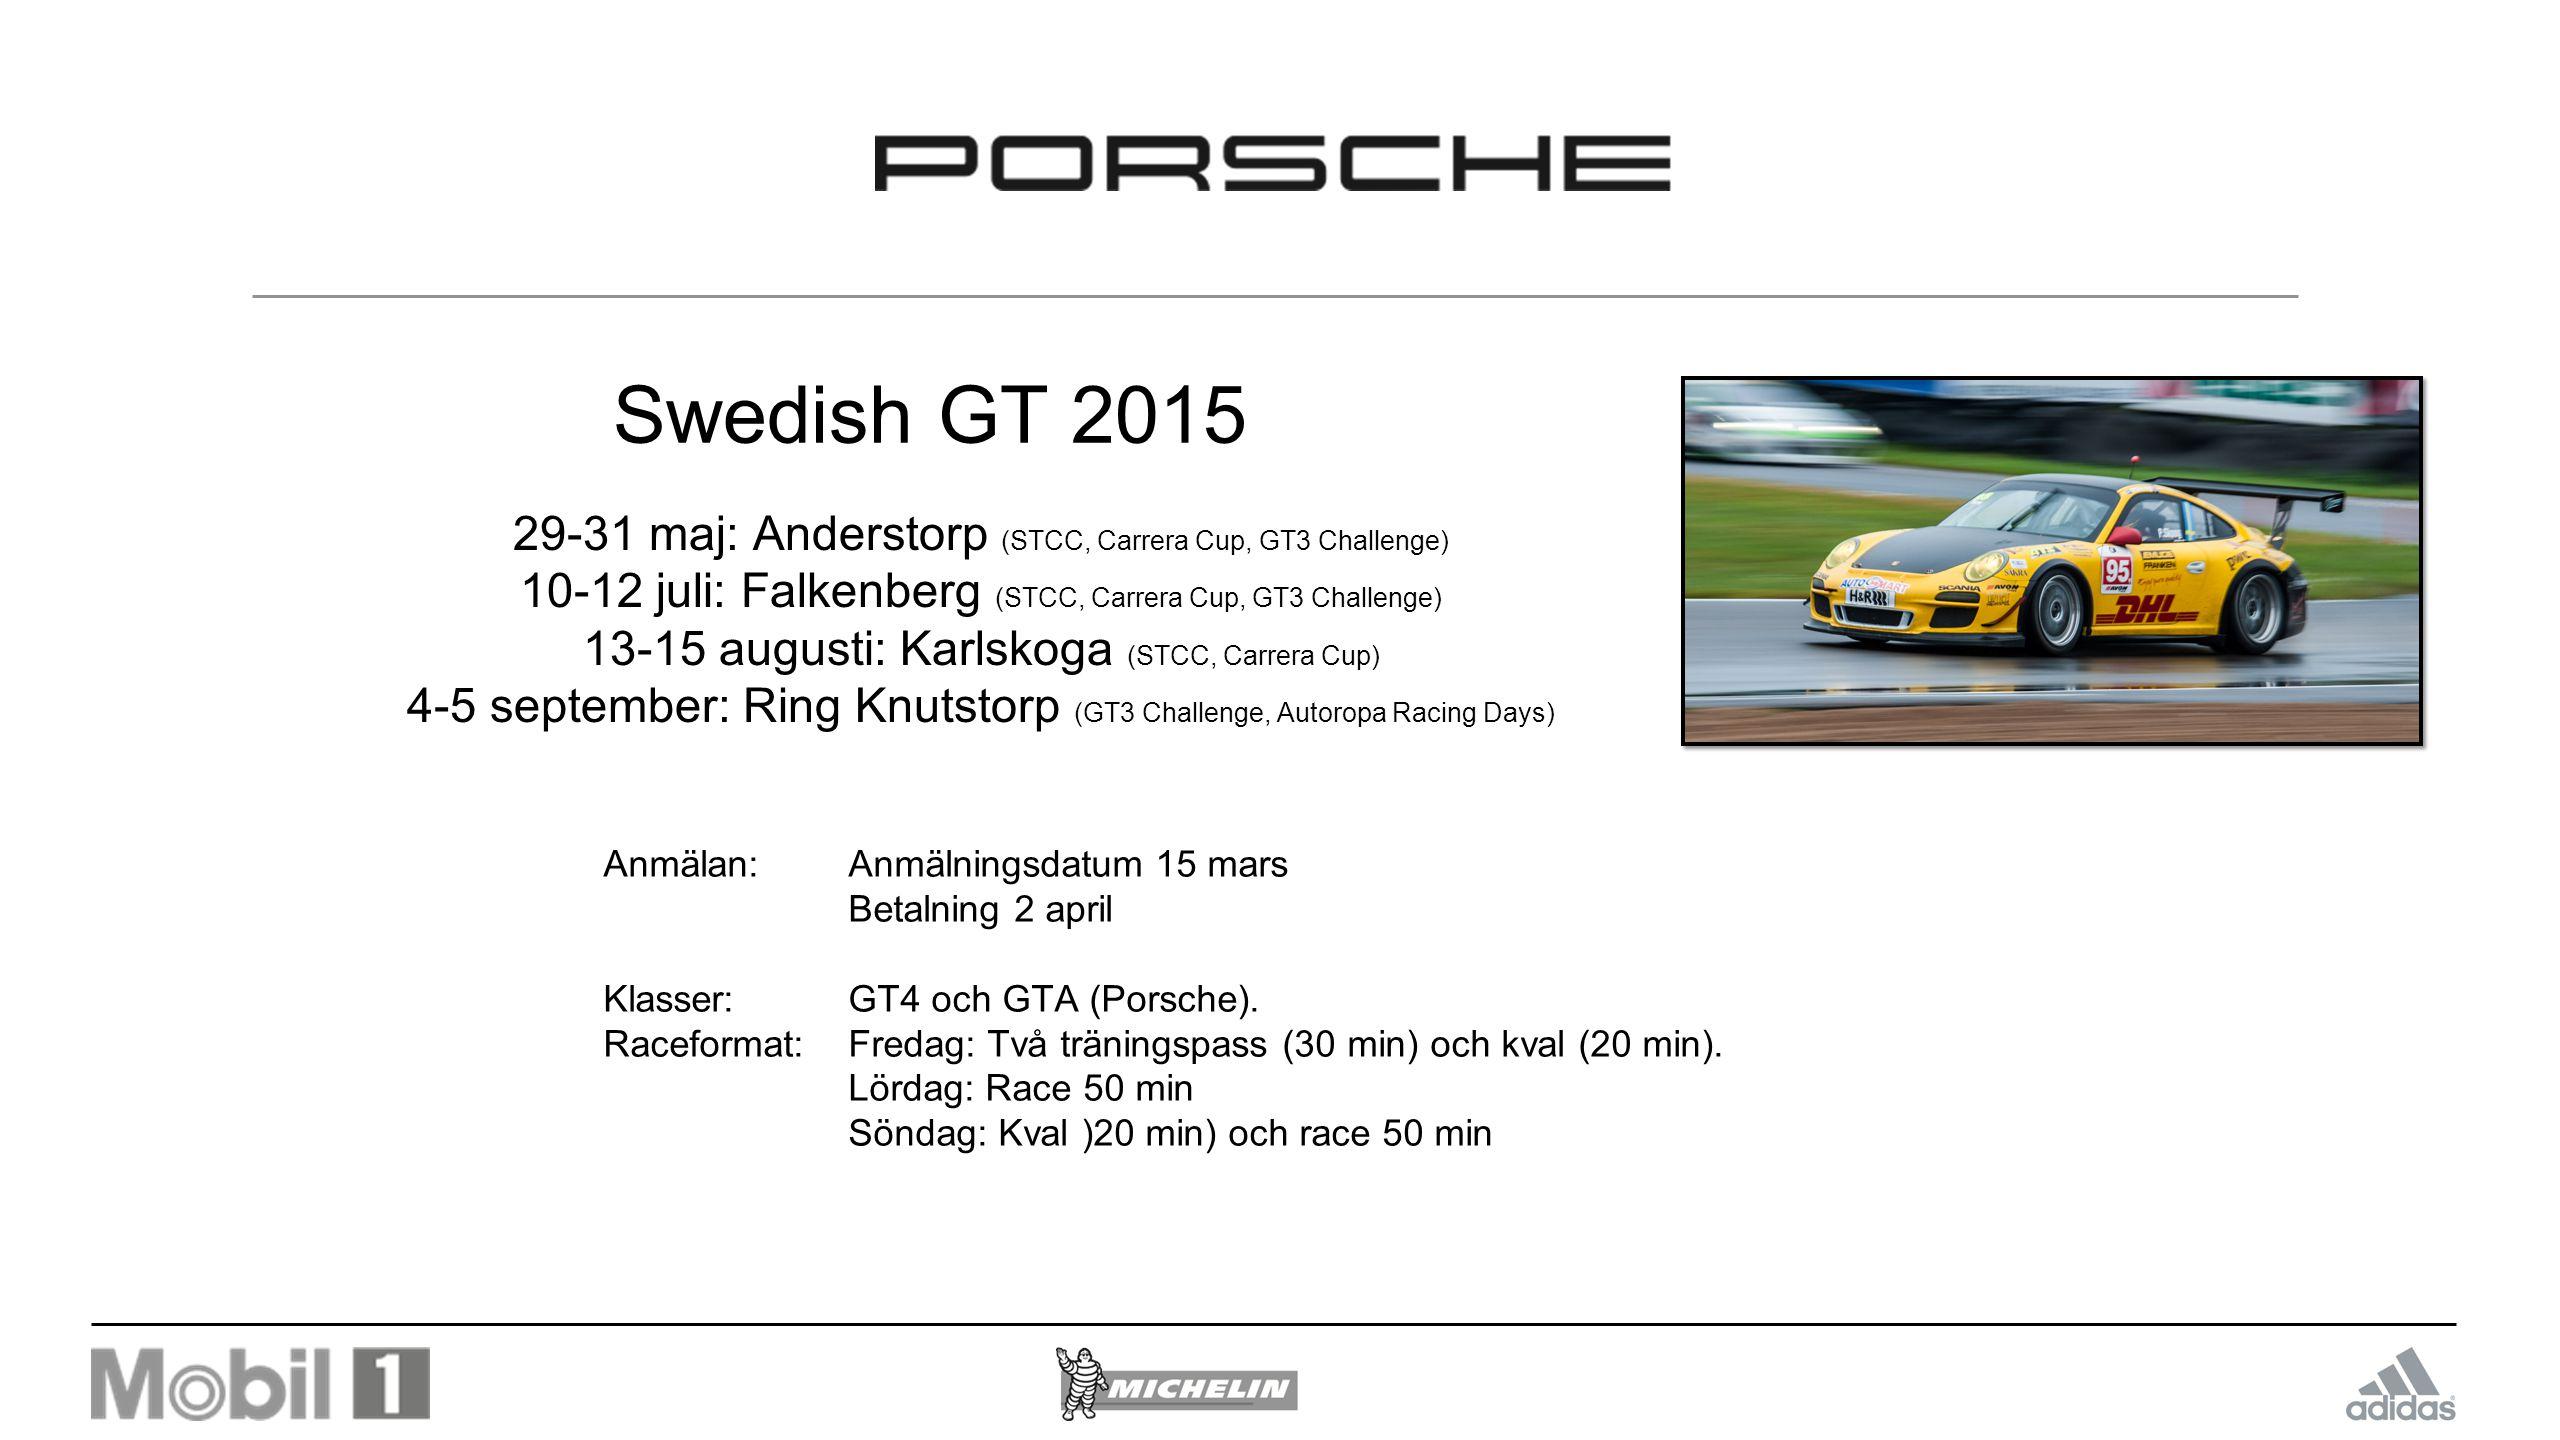 Swedish GT 2015 29-31 maj: Anderstorp (STCC, Carrera Cup, GT3 Challenge) 10-12 juli: Falkenberg (STCC, Carrera Cup, GT3 Challenge)